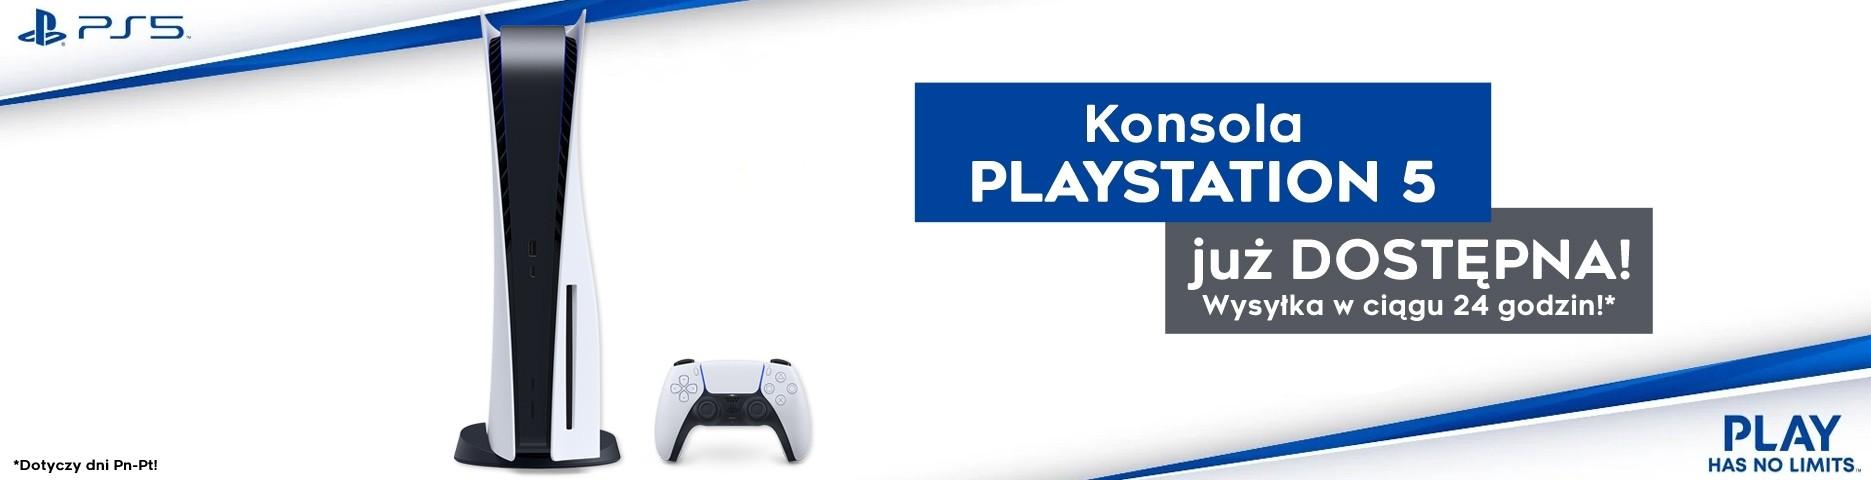 Konsola PlayStation 5 już dostępna!